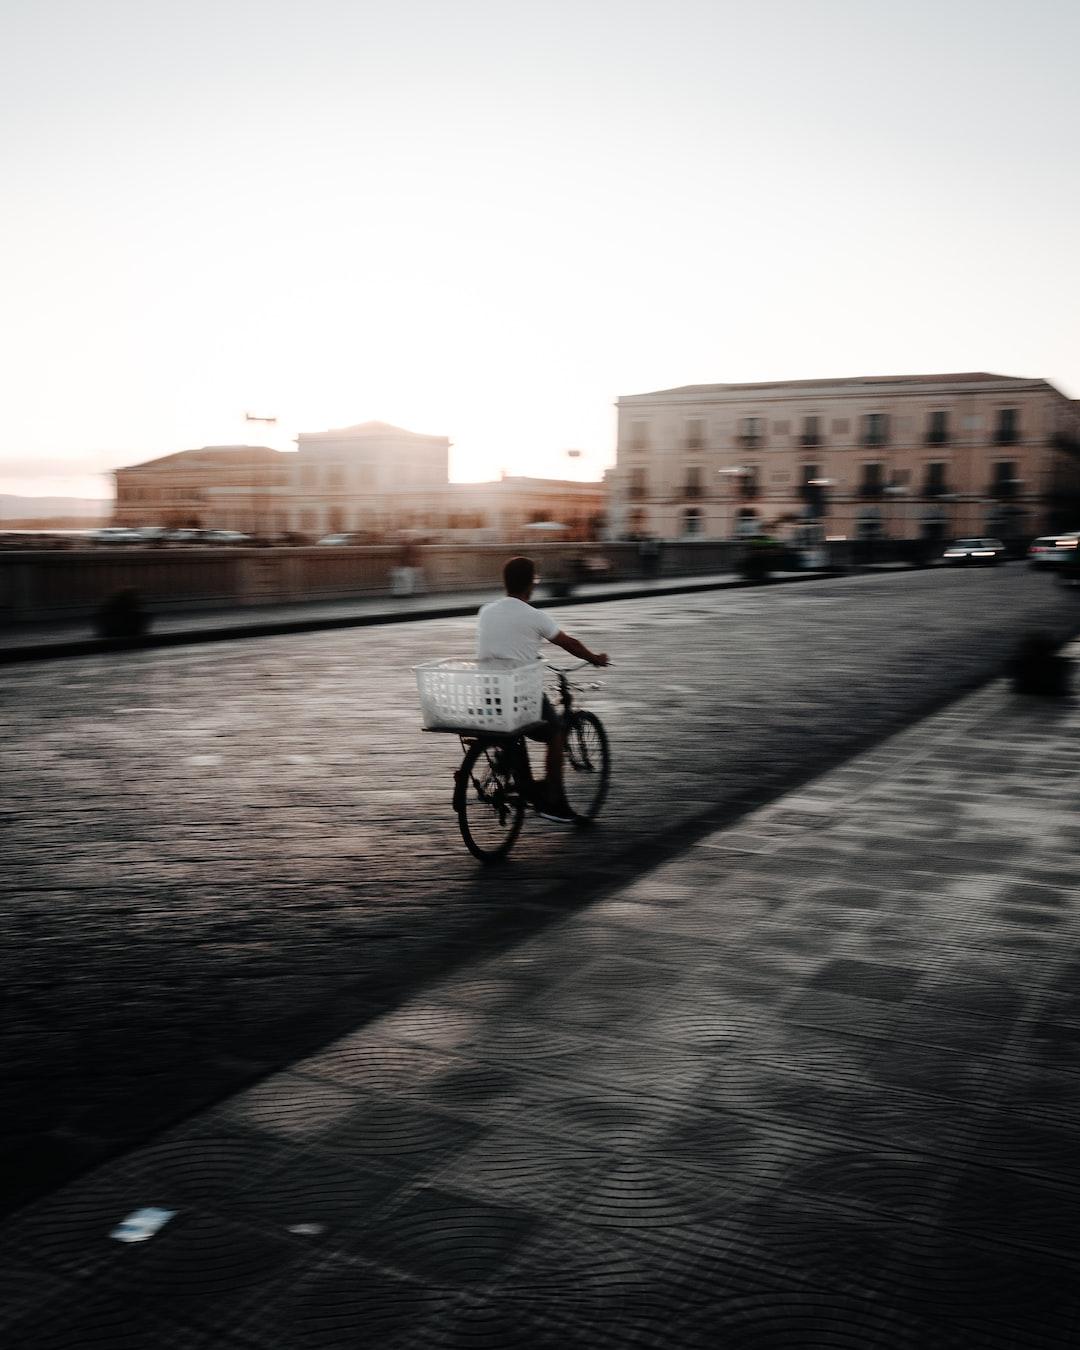 Busy man on a bike